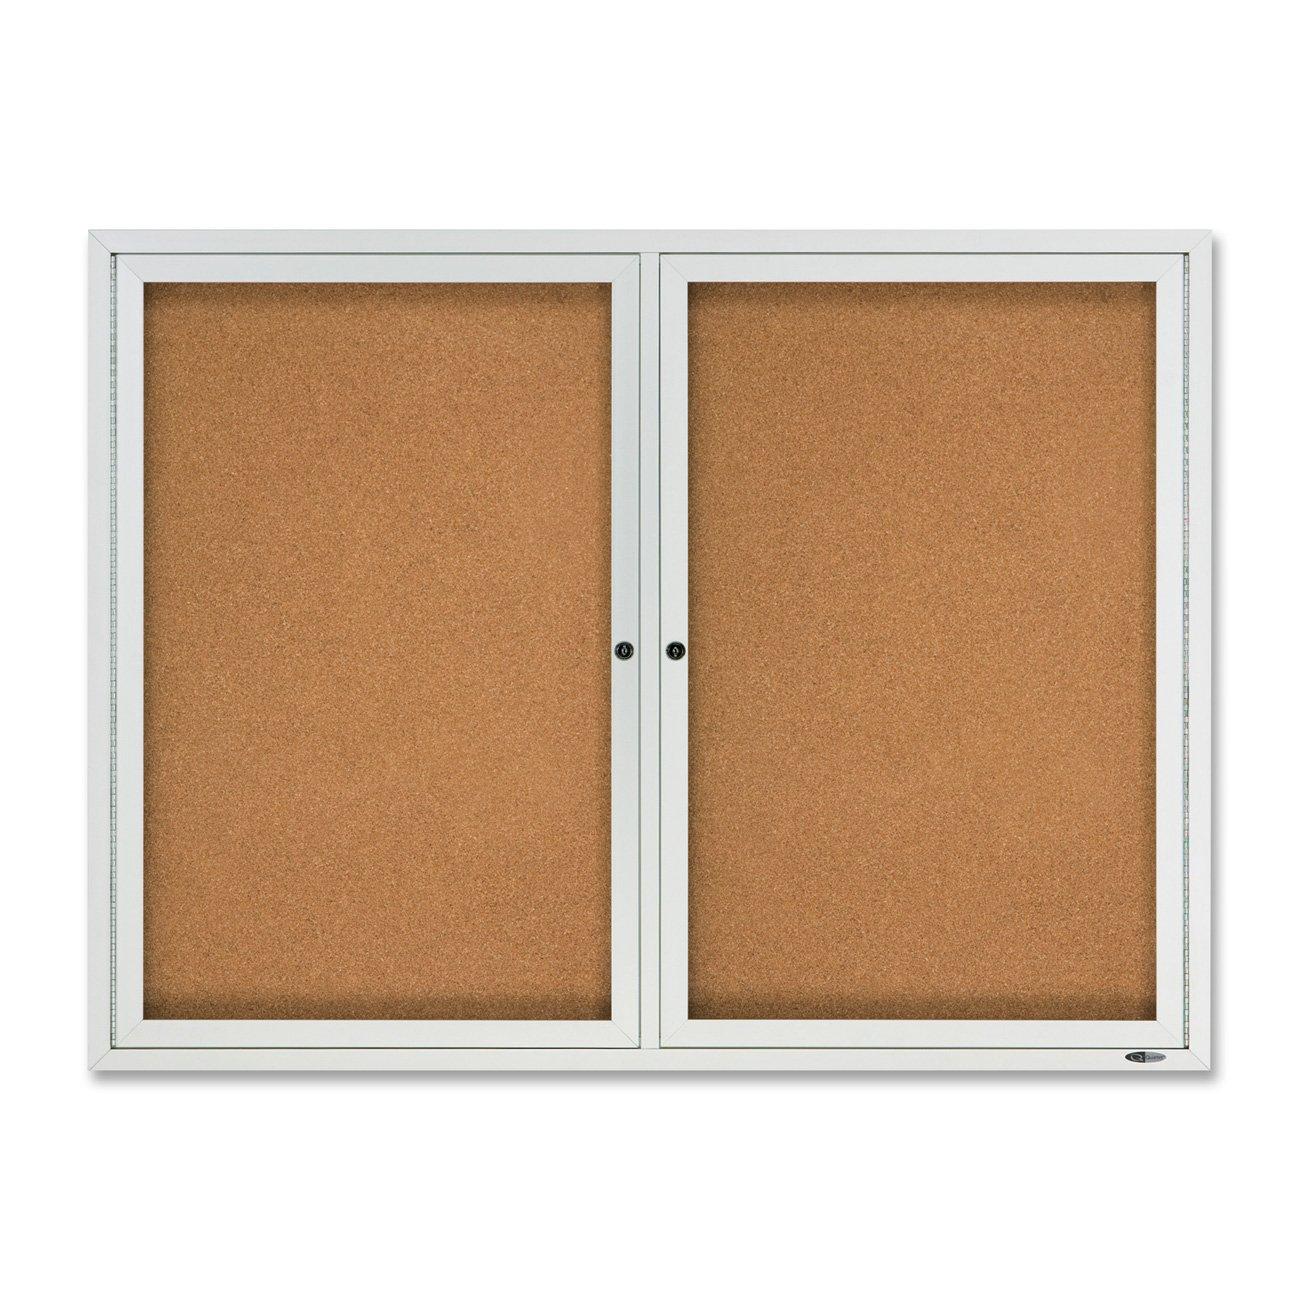 Quartet Outdoor Cork Bulletin Board, Enclosed, 4 x 3 Feet, Aluminum Frame (2124) by Quartet